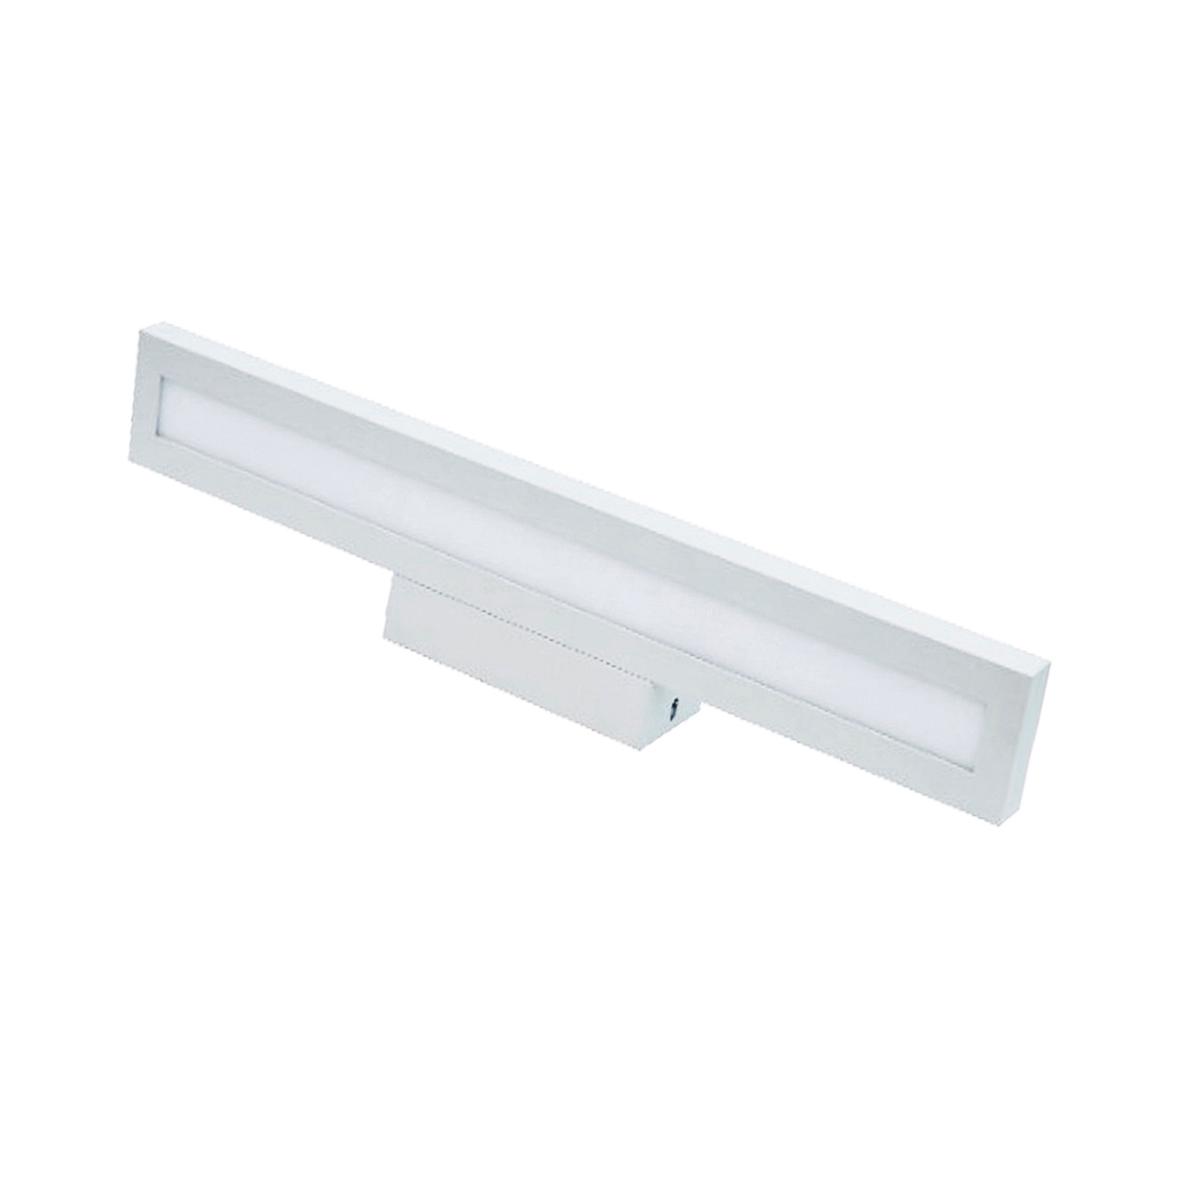 Applique Specchio Bagno Moderno b70-9w - applique led - - lampada led da parete 9w quadro